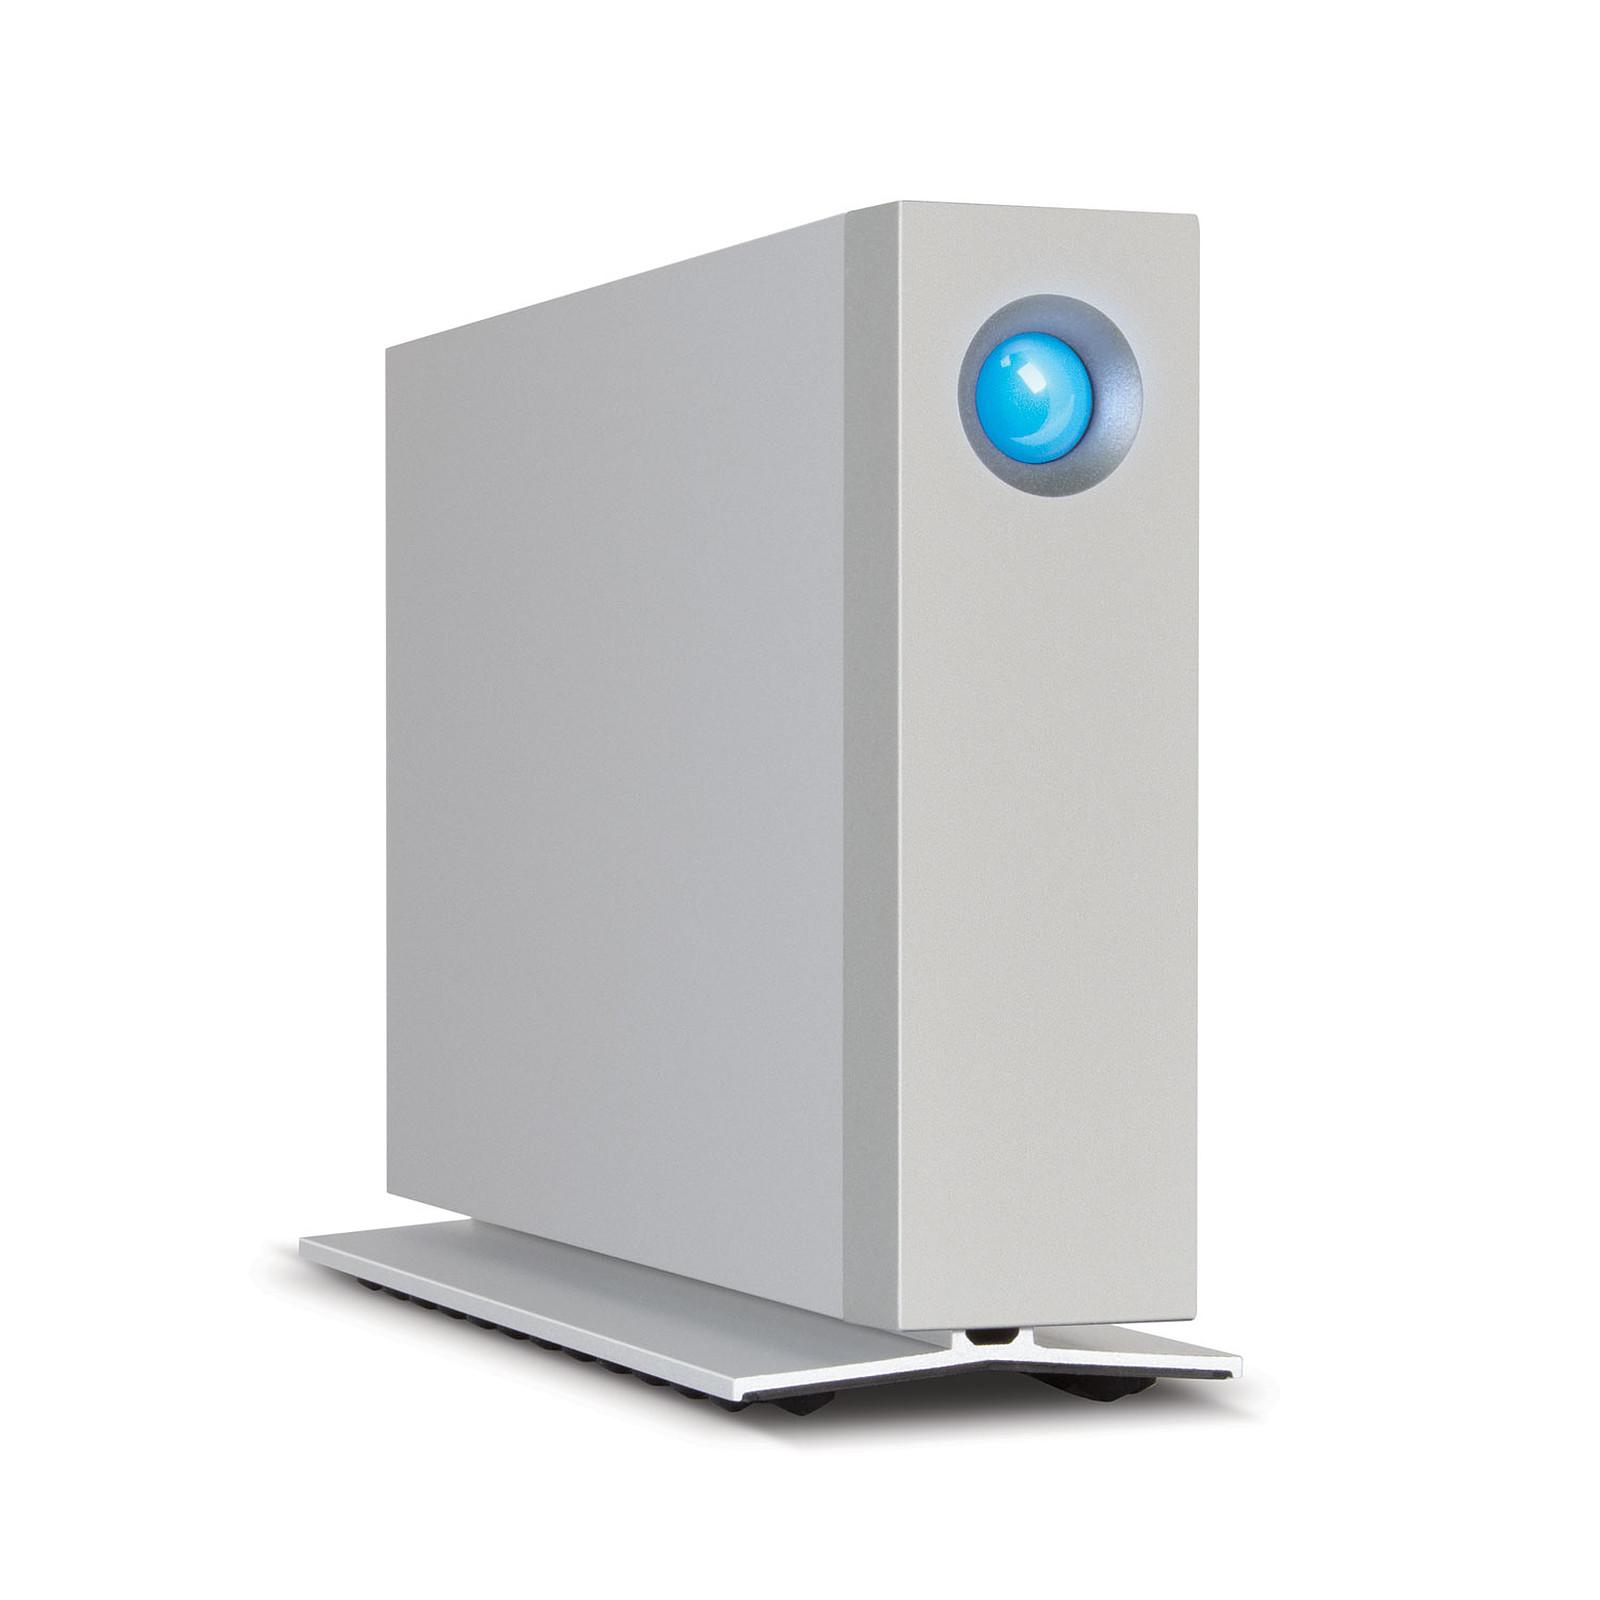 LaCie d2 USB 3.0 (3 To)